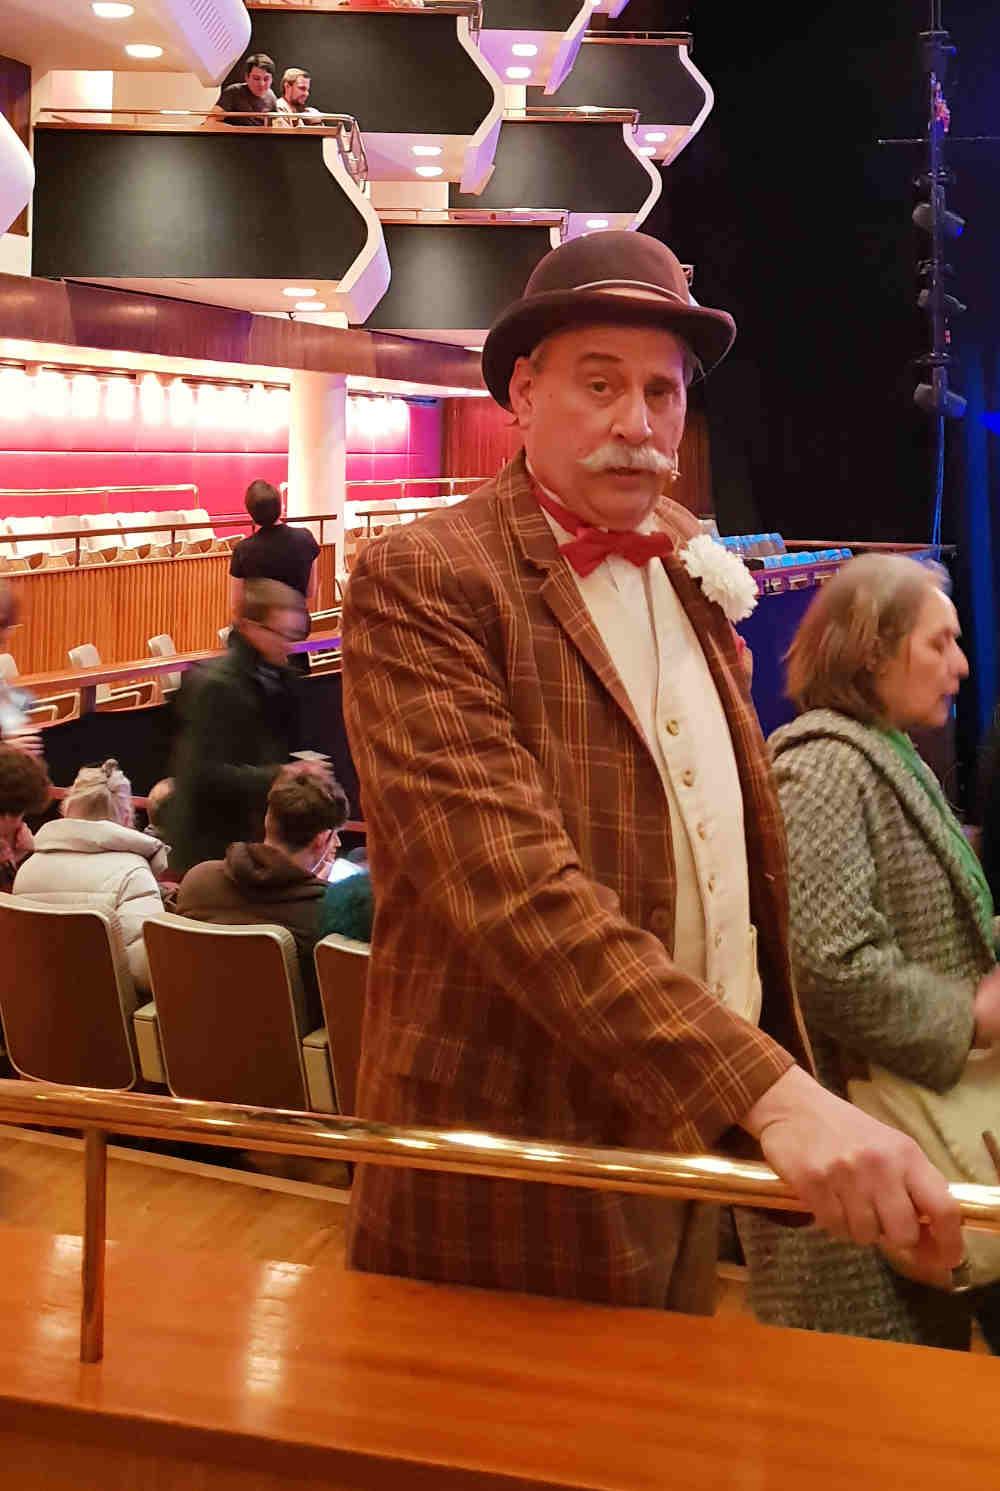 Circus 1903 Ringmaster, Willy Whispsnade